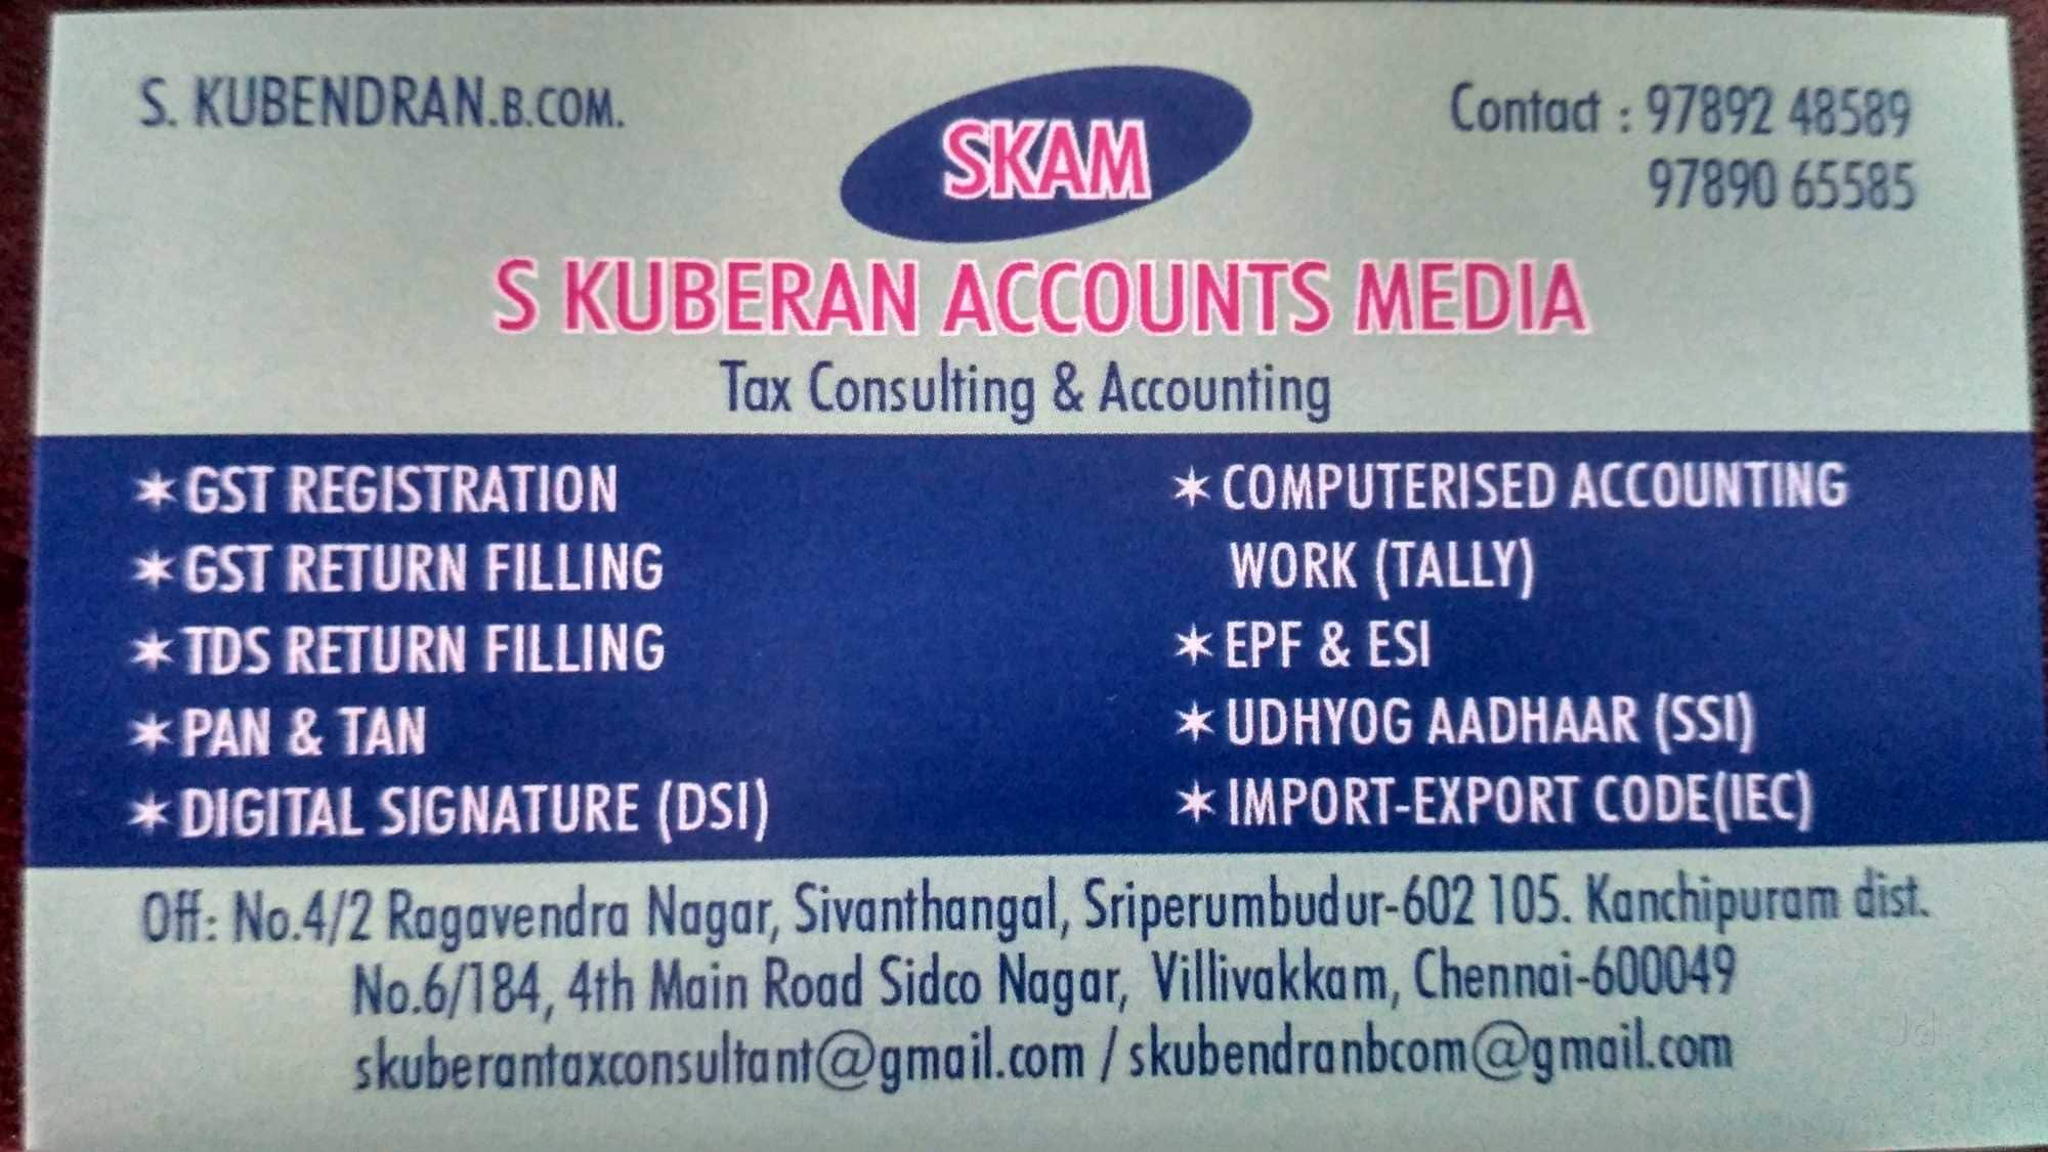 Top 50 GST Consultants in Sriperumbudur - Best GST Registration